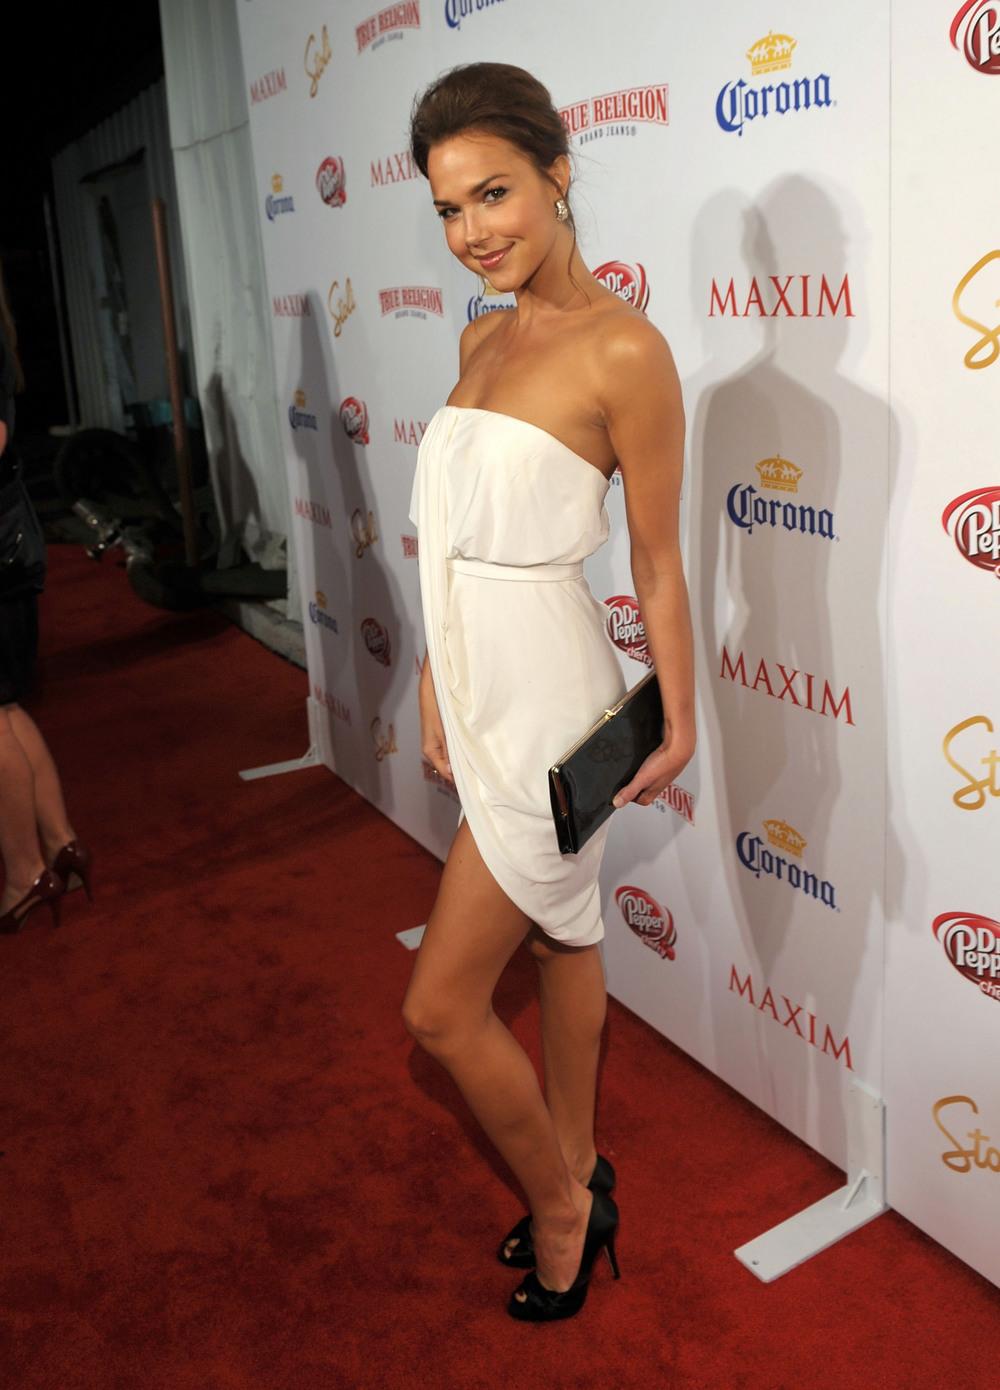 Arielle-at-Maxim-Hot-100-Party-arielle-kebbel-6234935-1842-2560.jpg